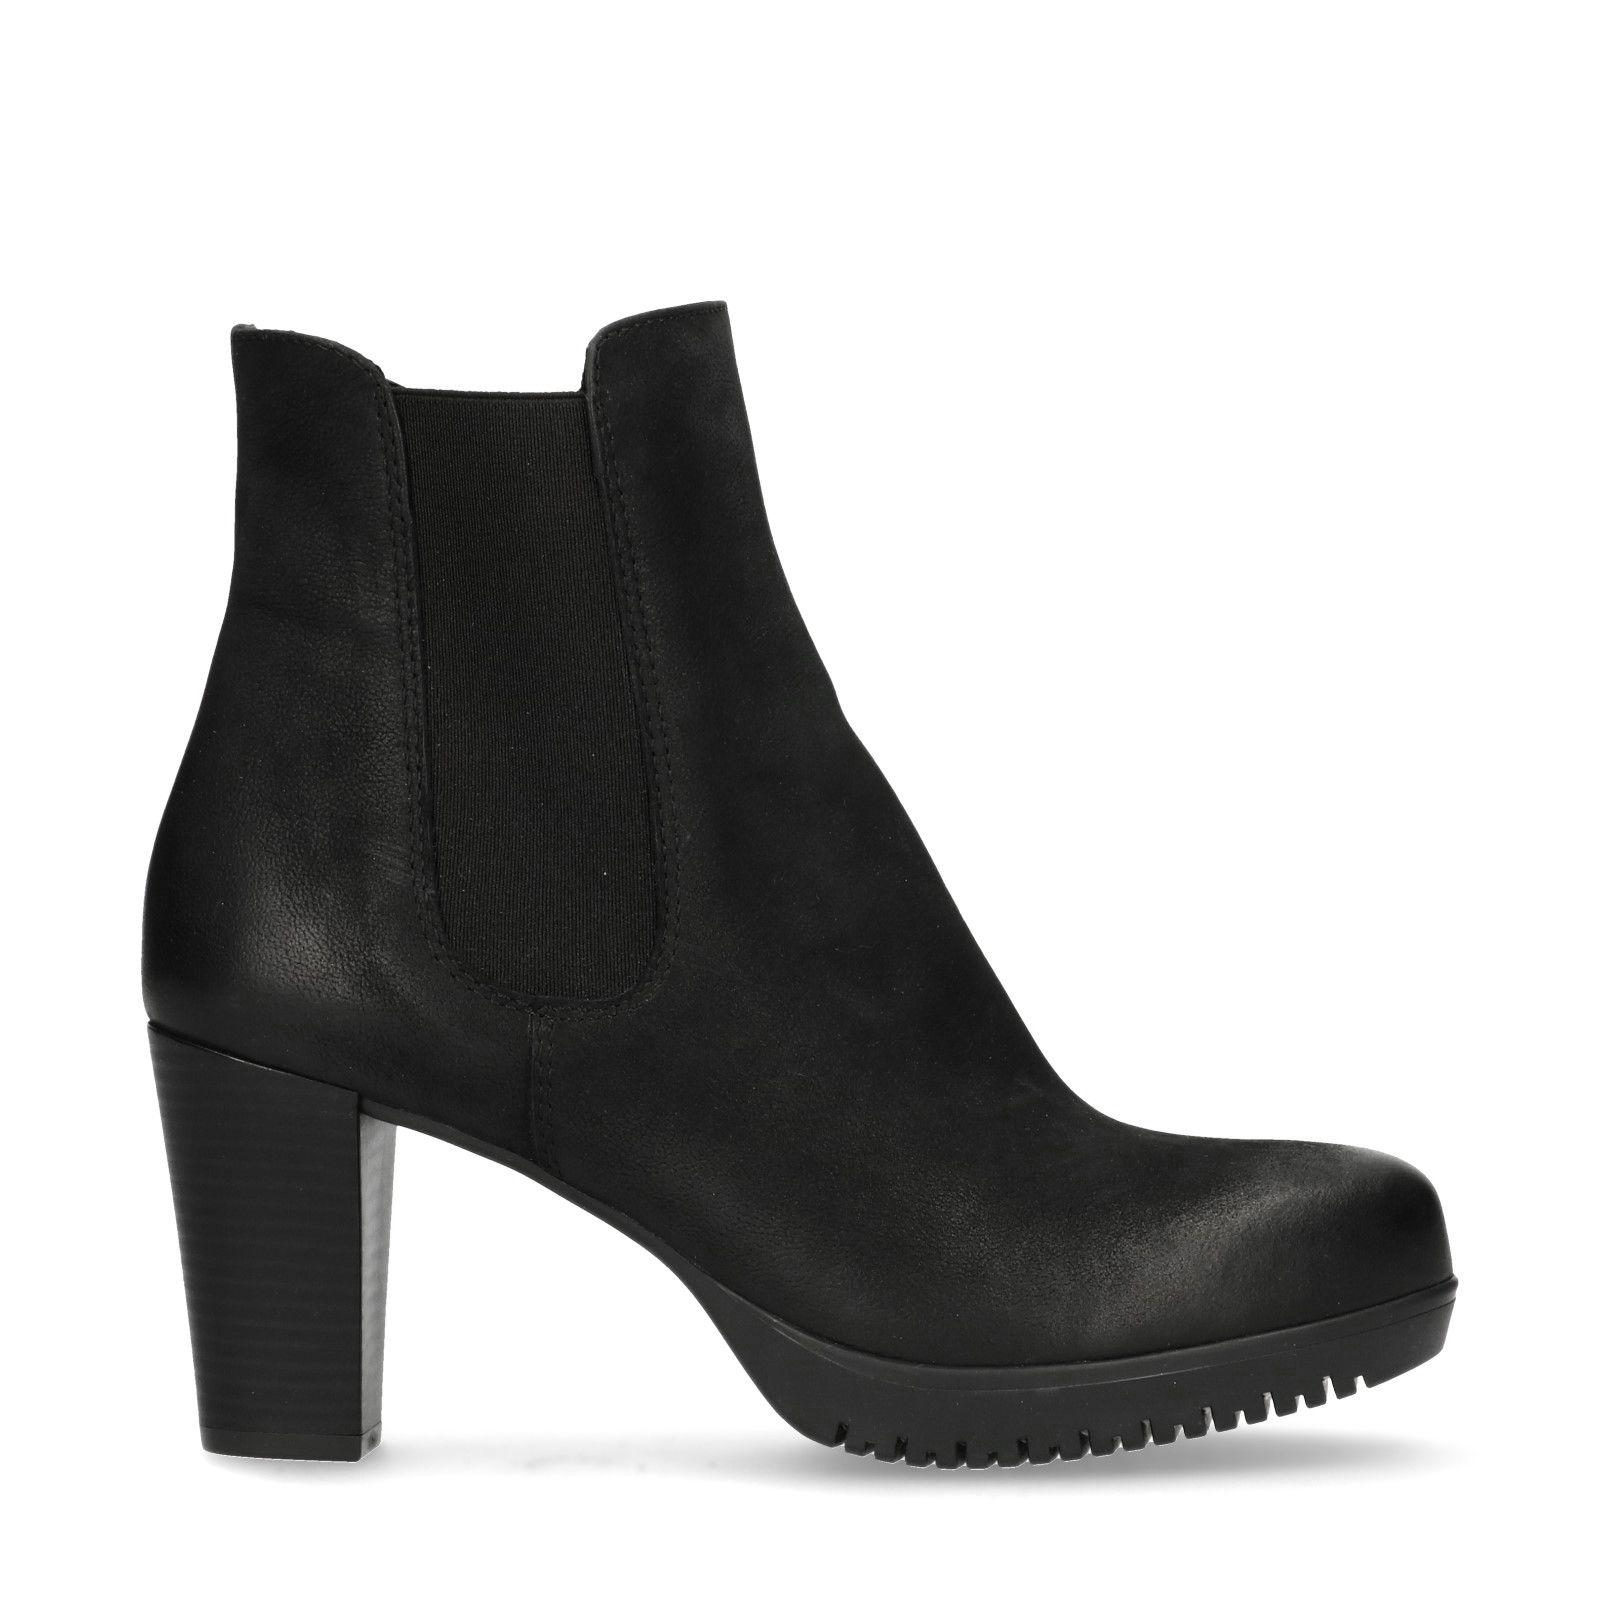 0125d510fd4475 Schwarze Chelsea Boots mit Absatz